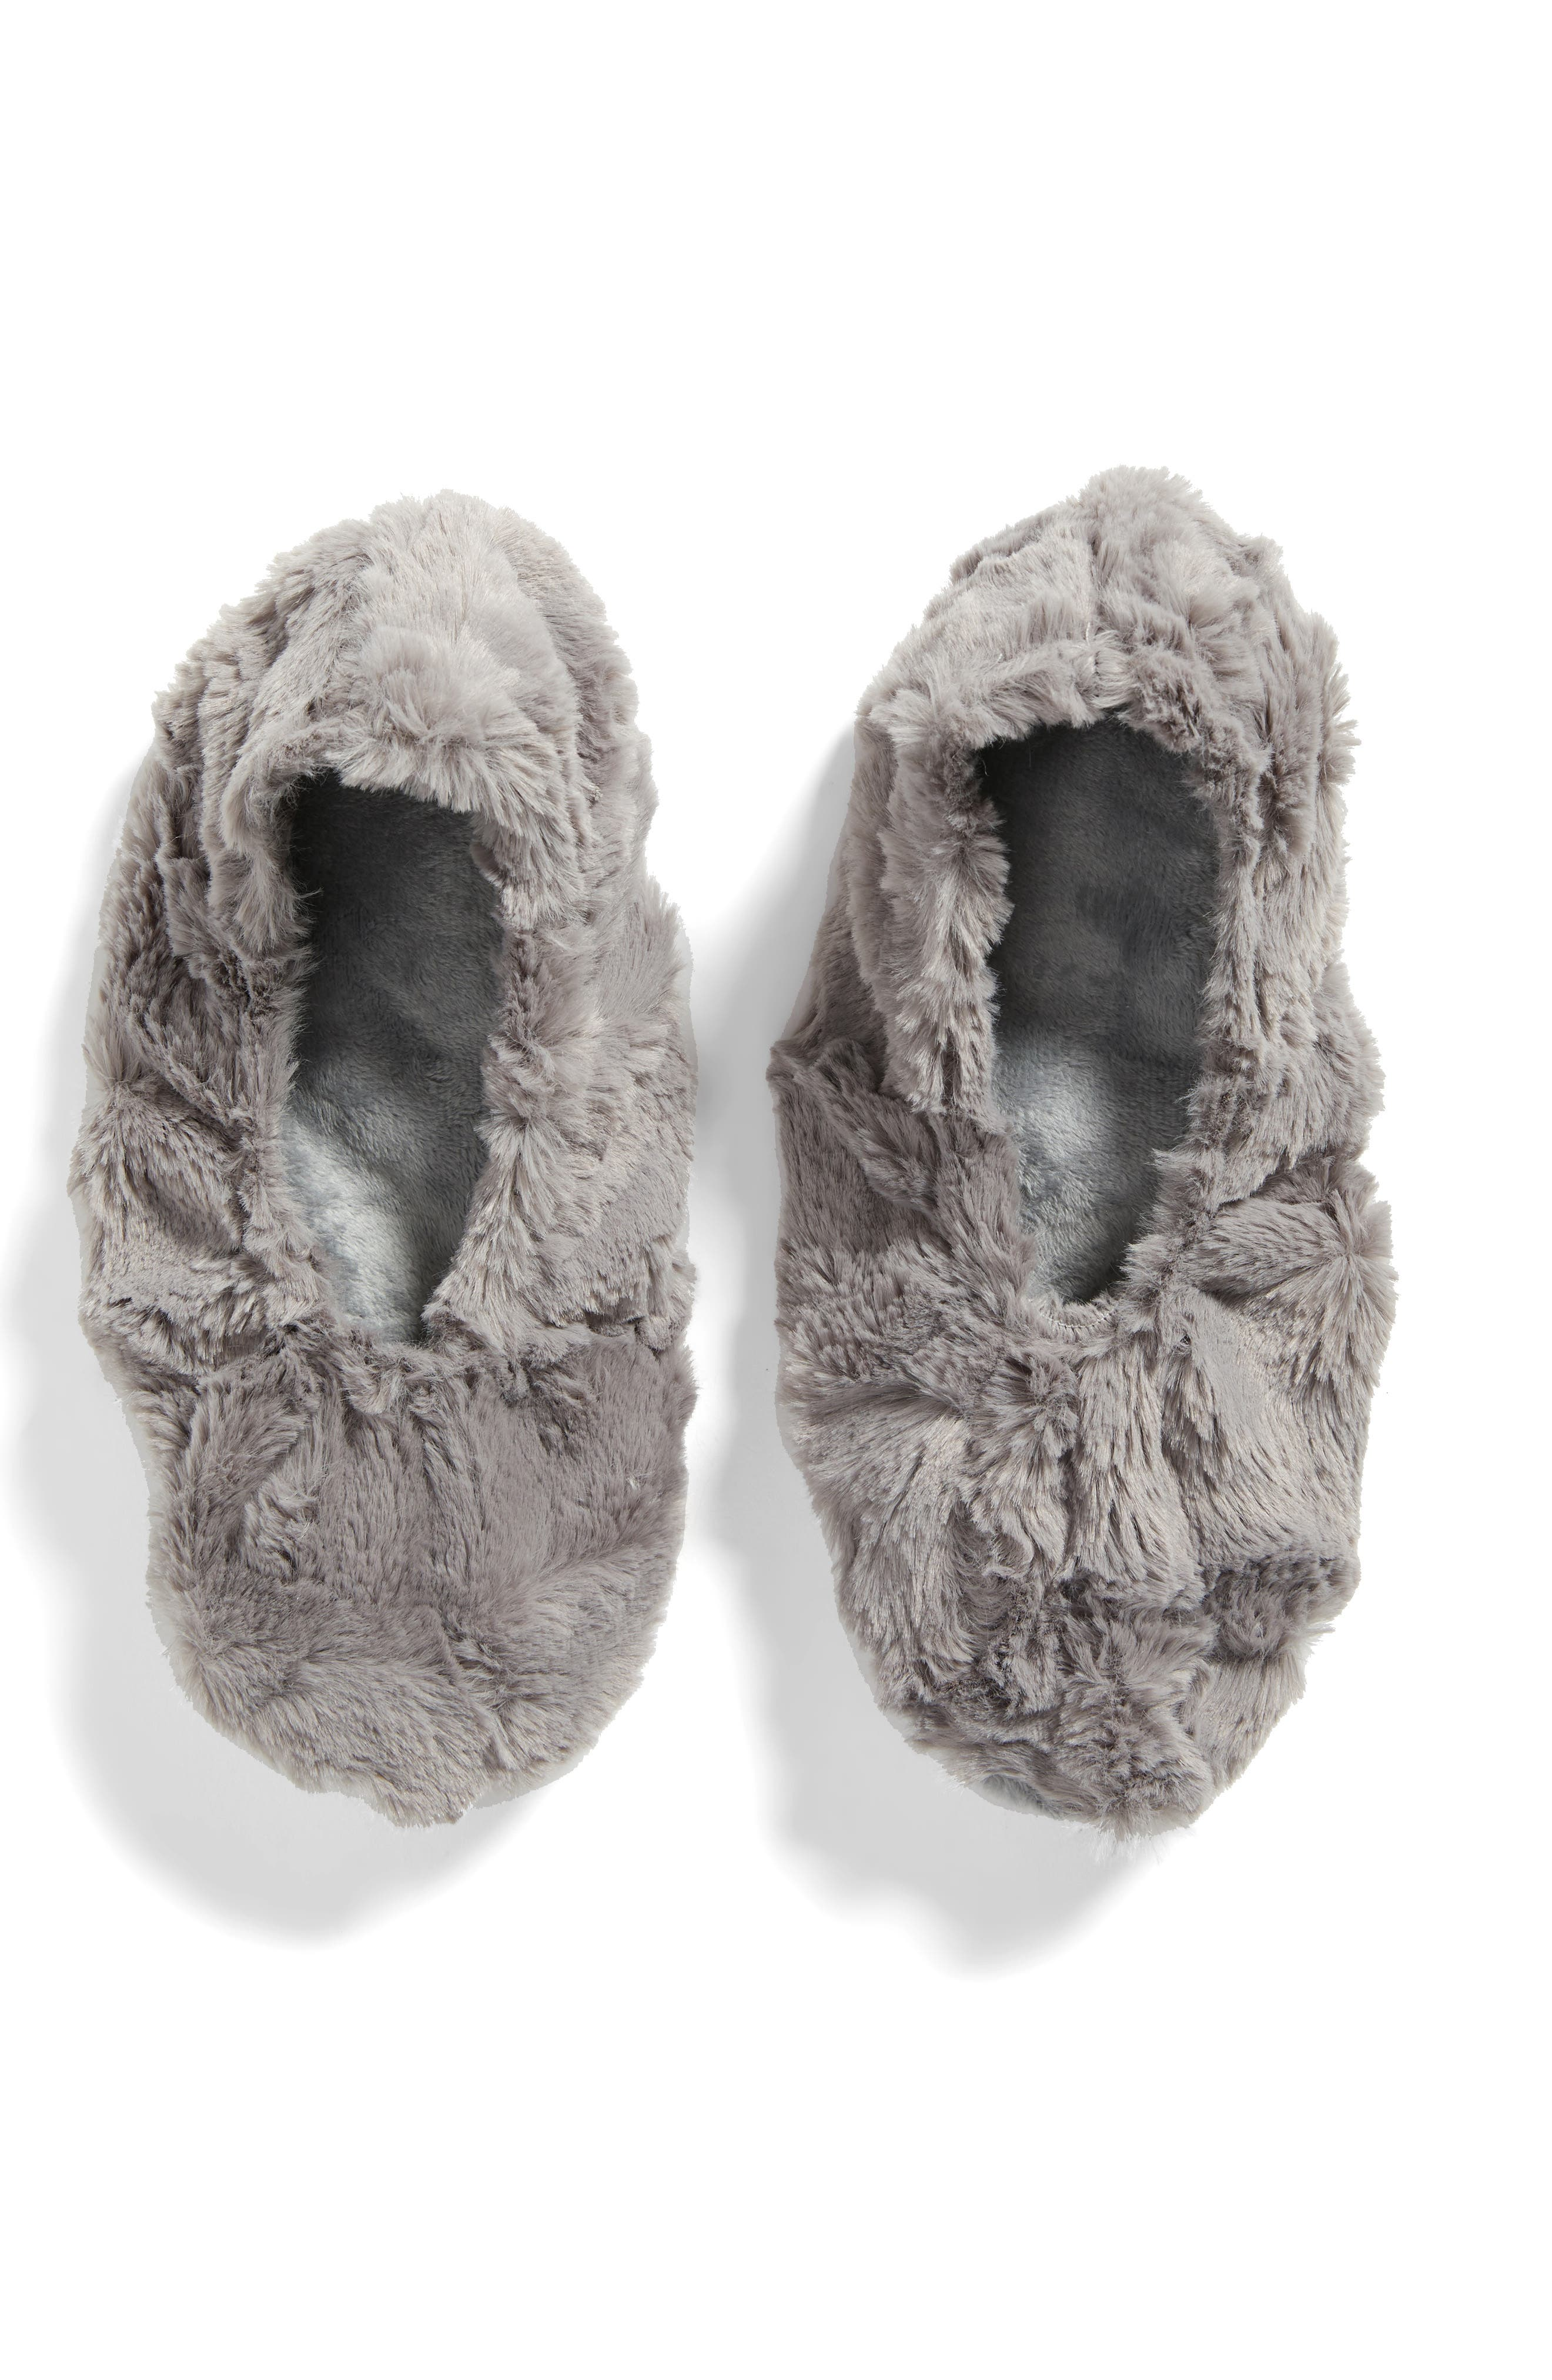 Sonoma Lavender Stonehide Footies